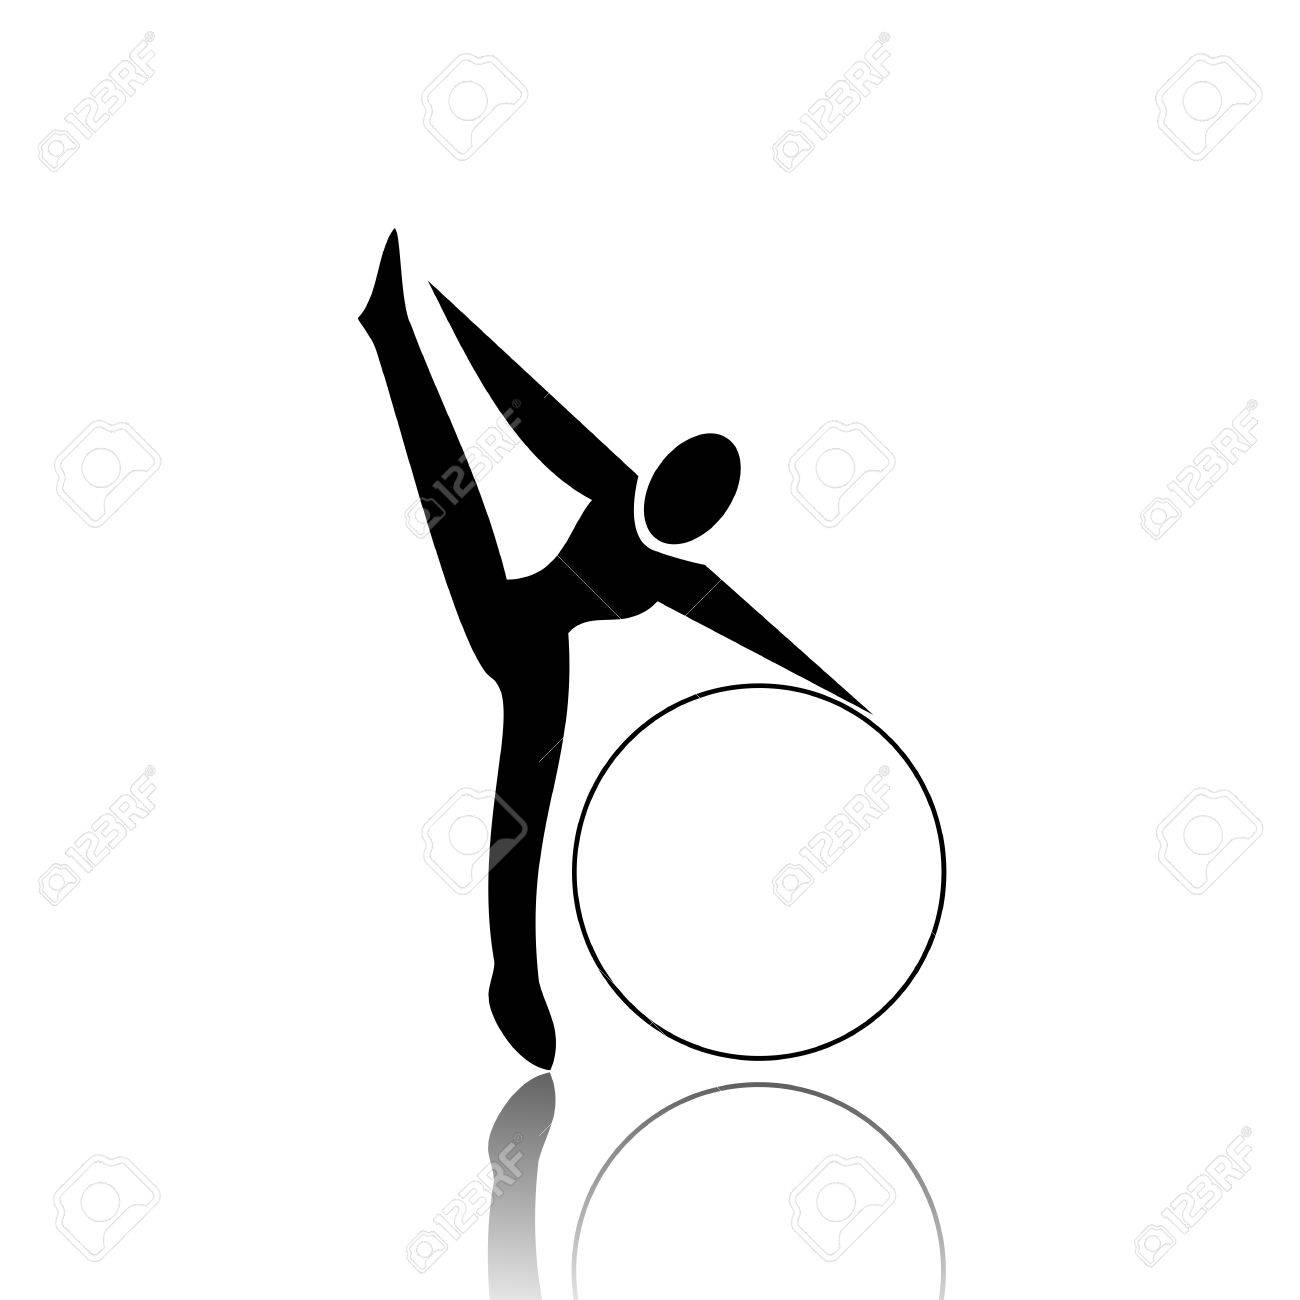 Rhythmic Gymnastics Stock Vector - 12467457